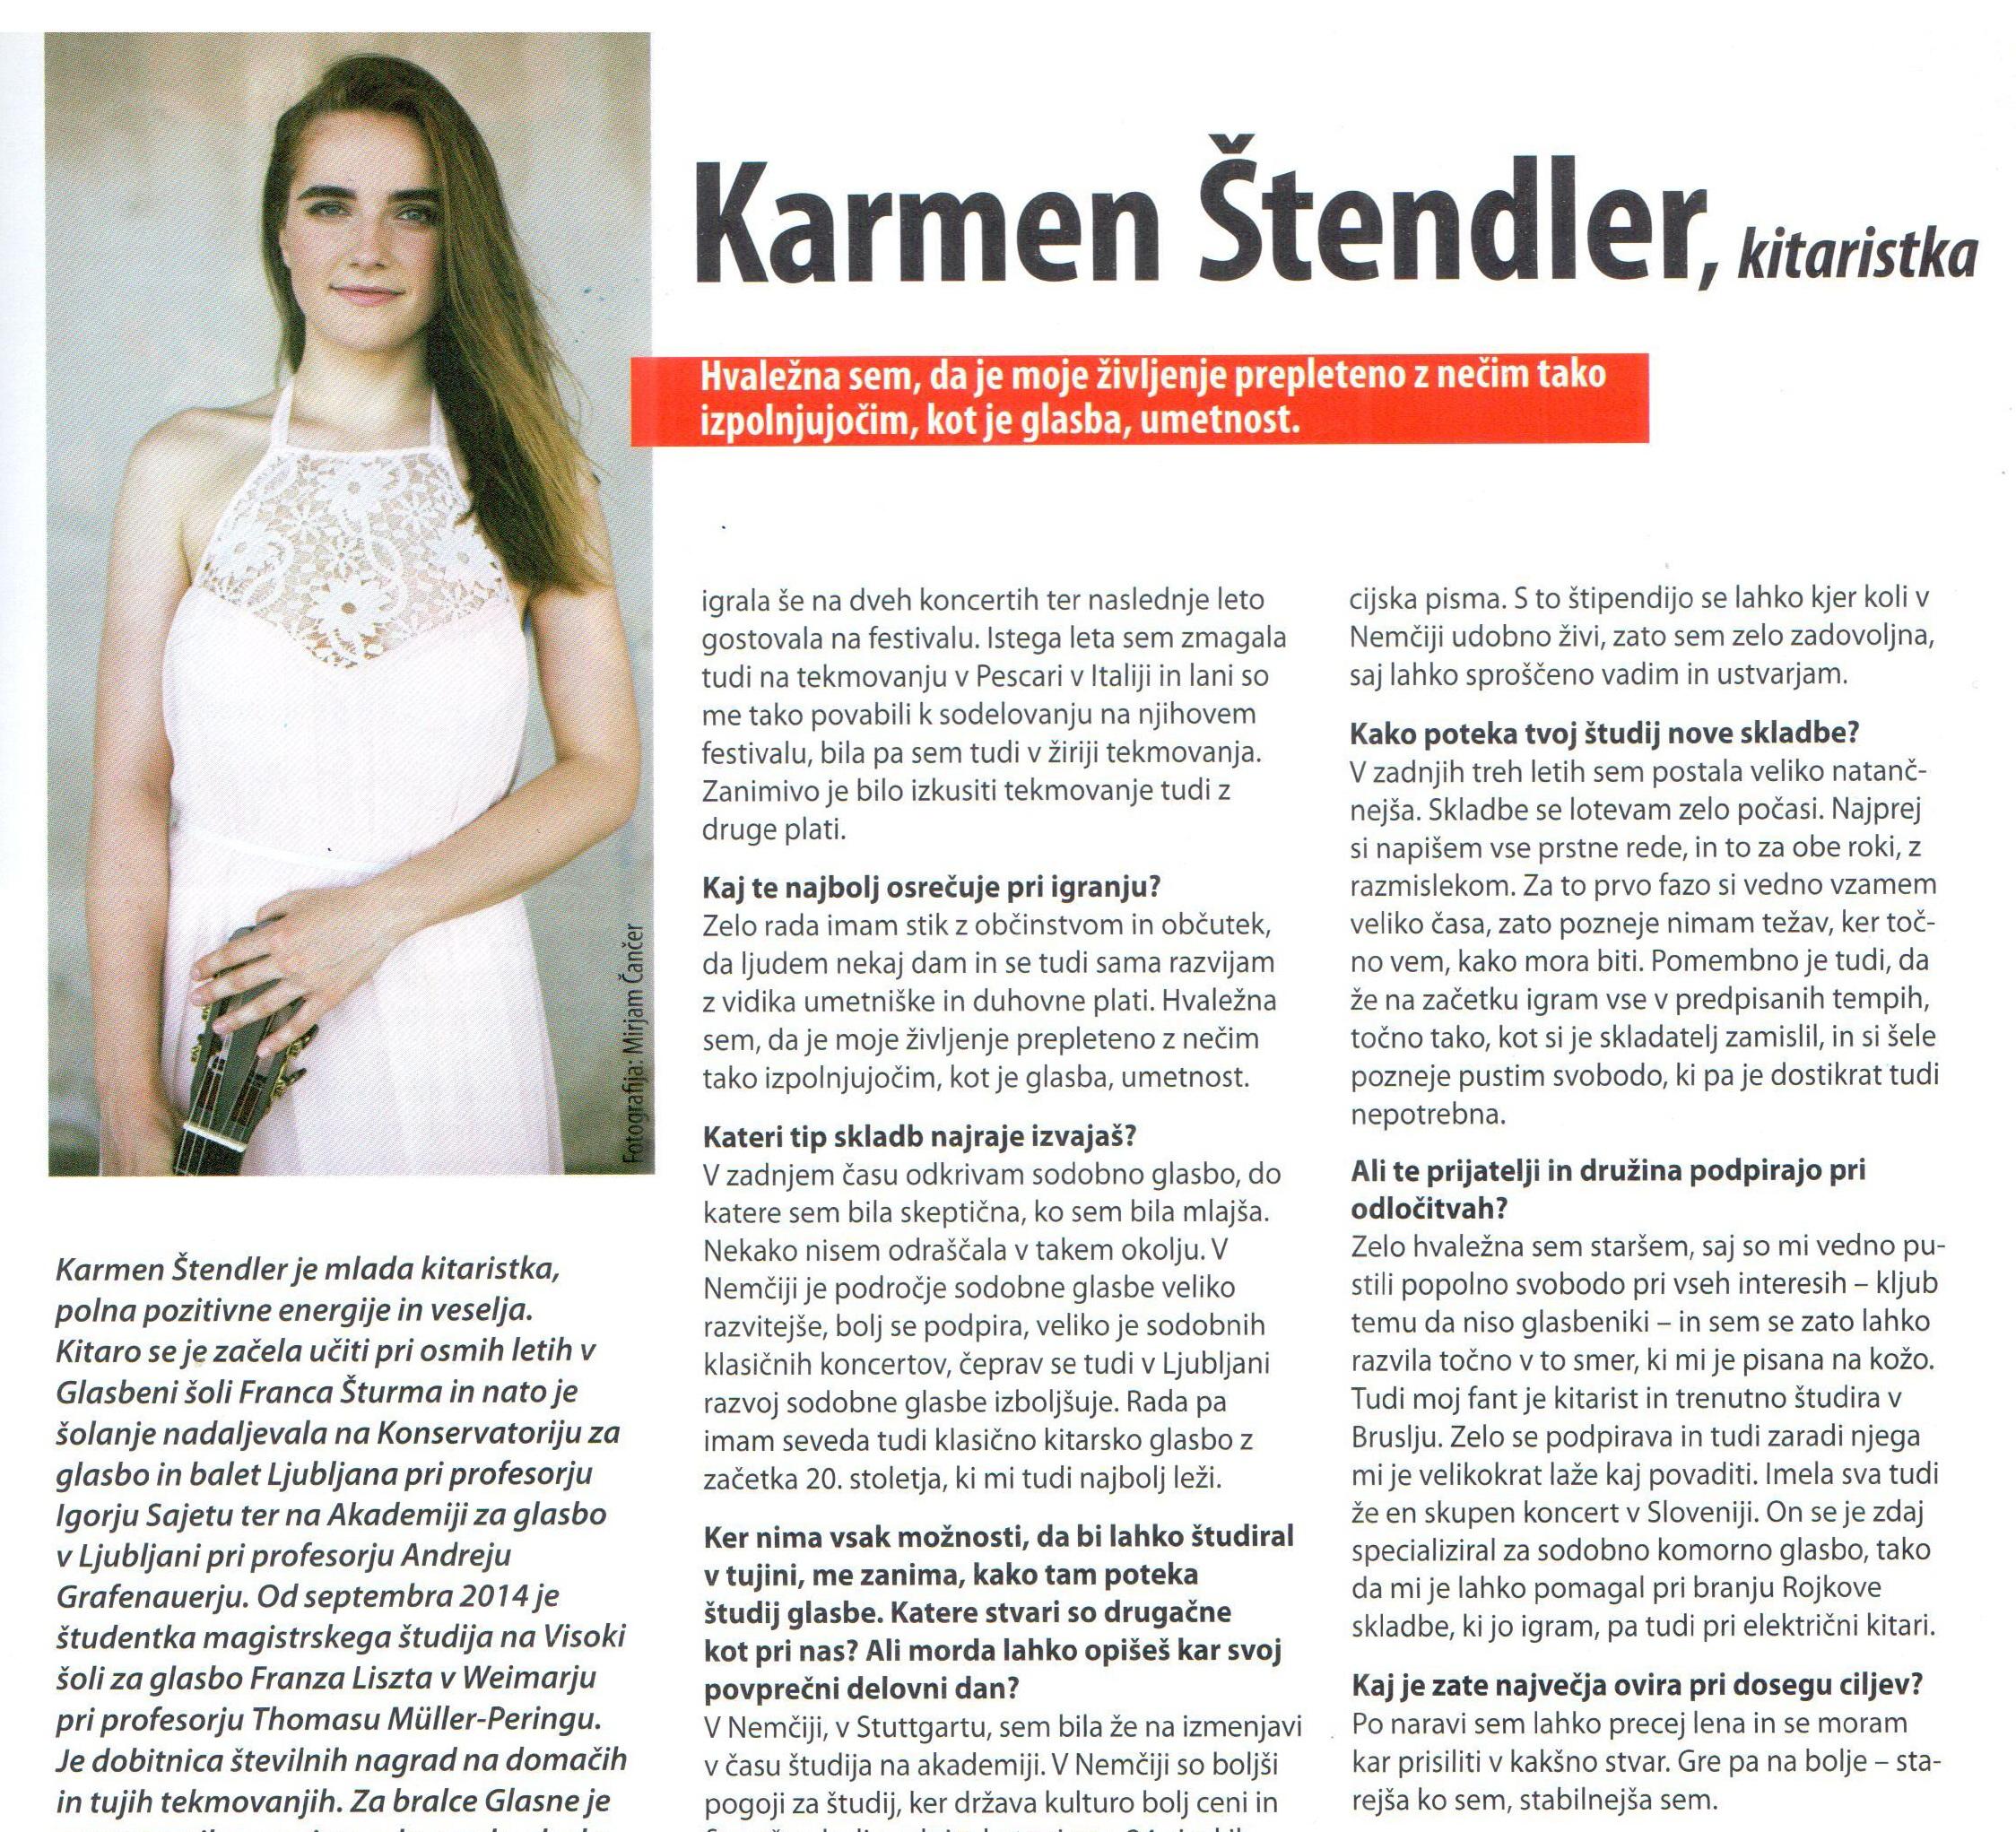 Karmen Štendler, kitaristka / Interview - Ana Milošević, Glasbena revija